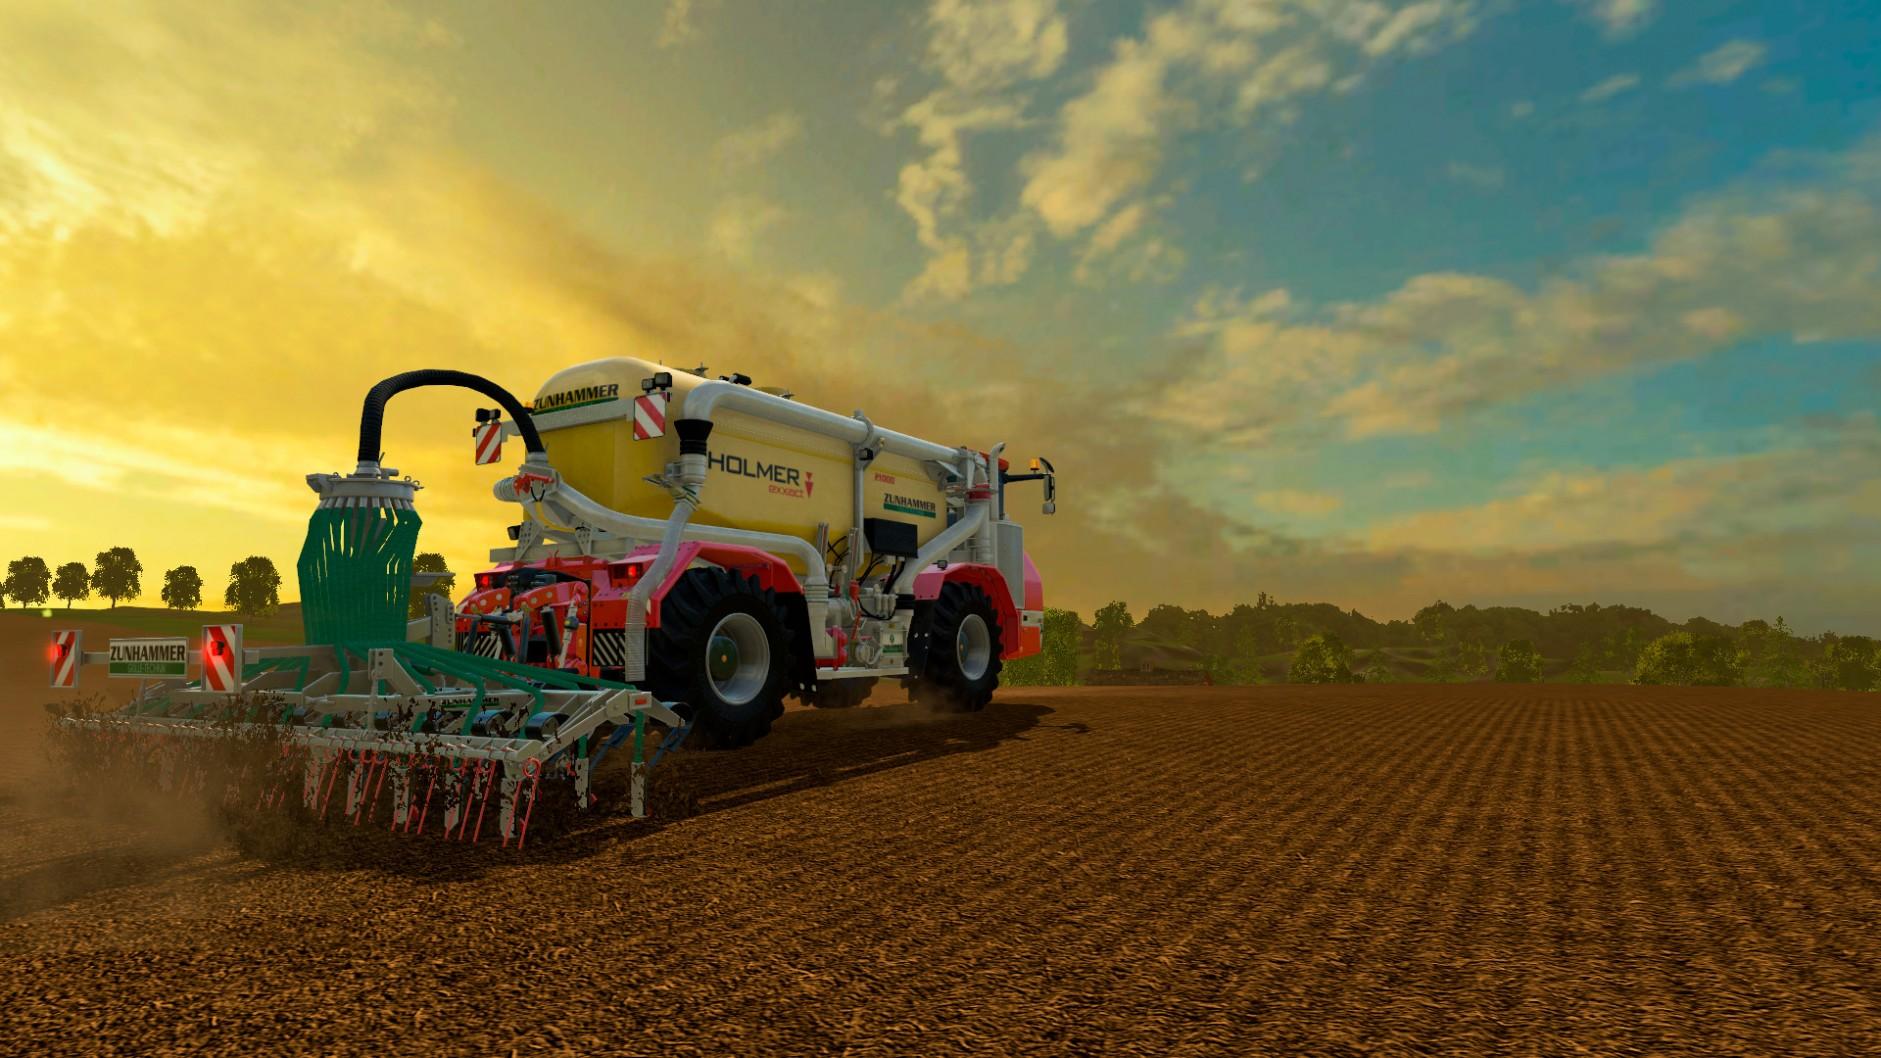 Farming Simulator 15 Holmer Setup Free Download